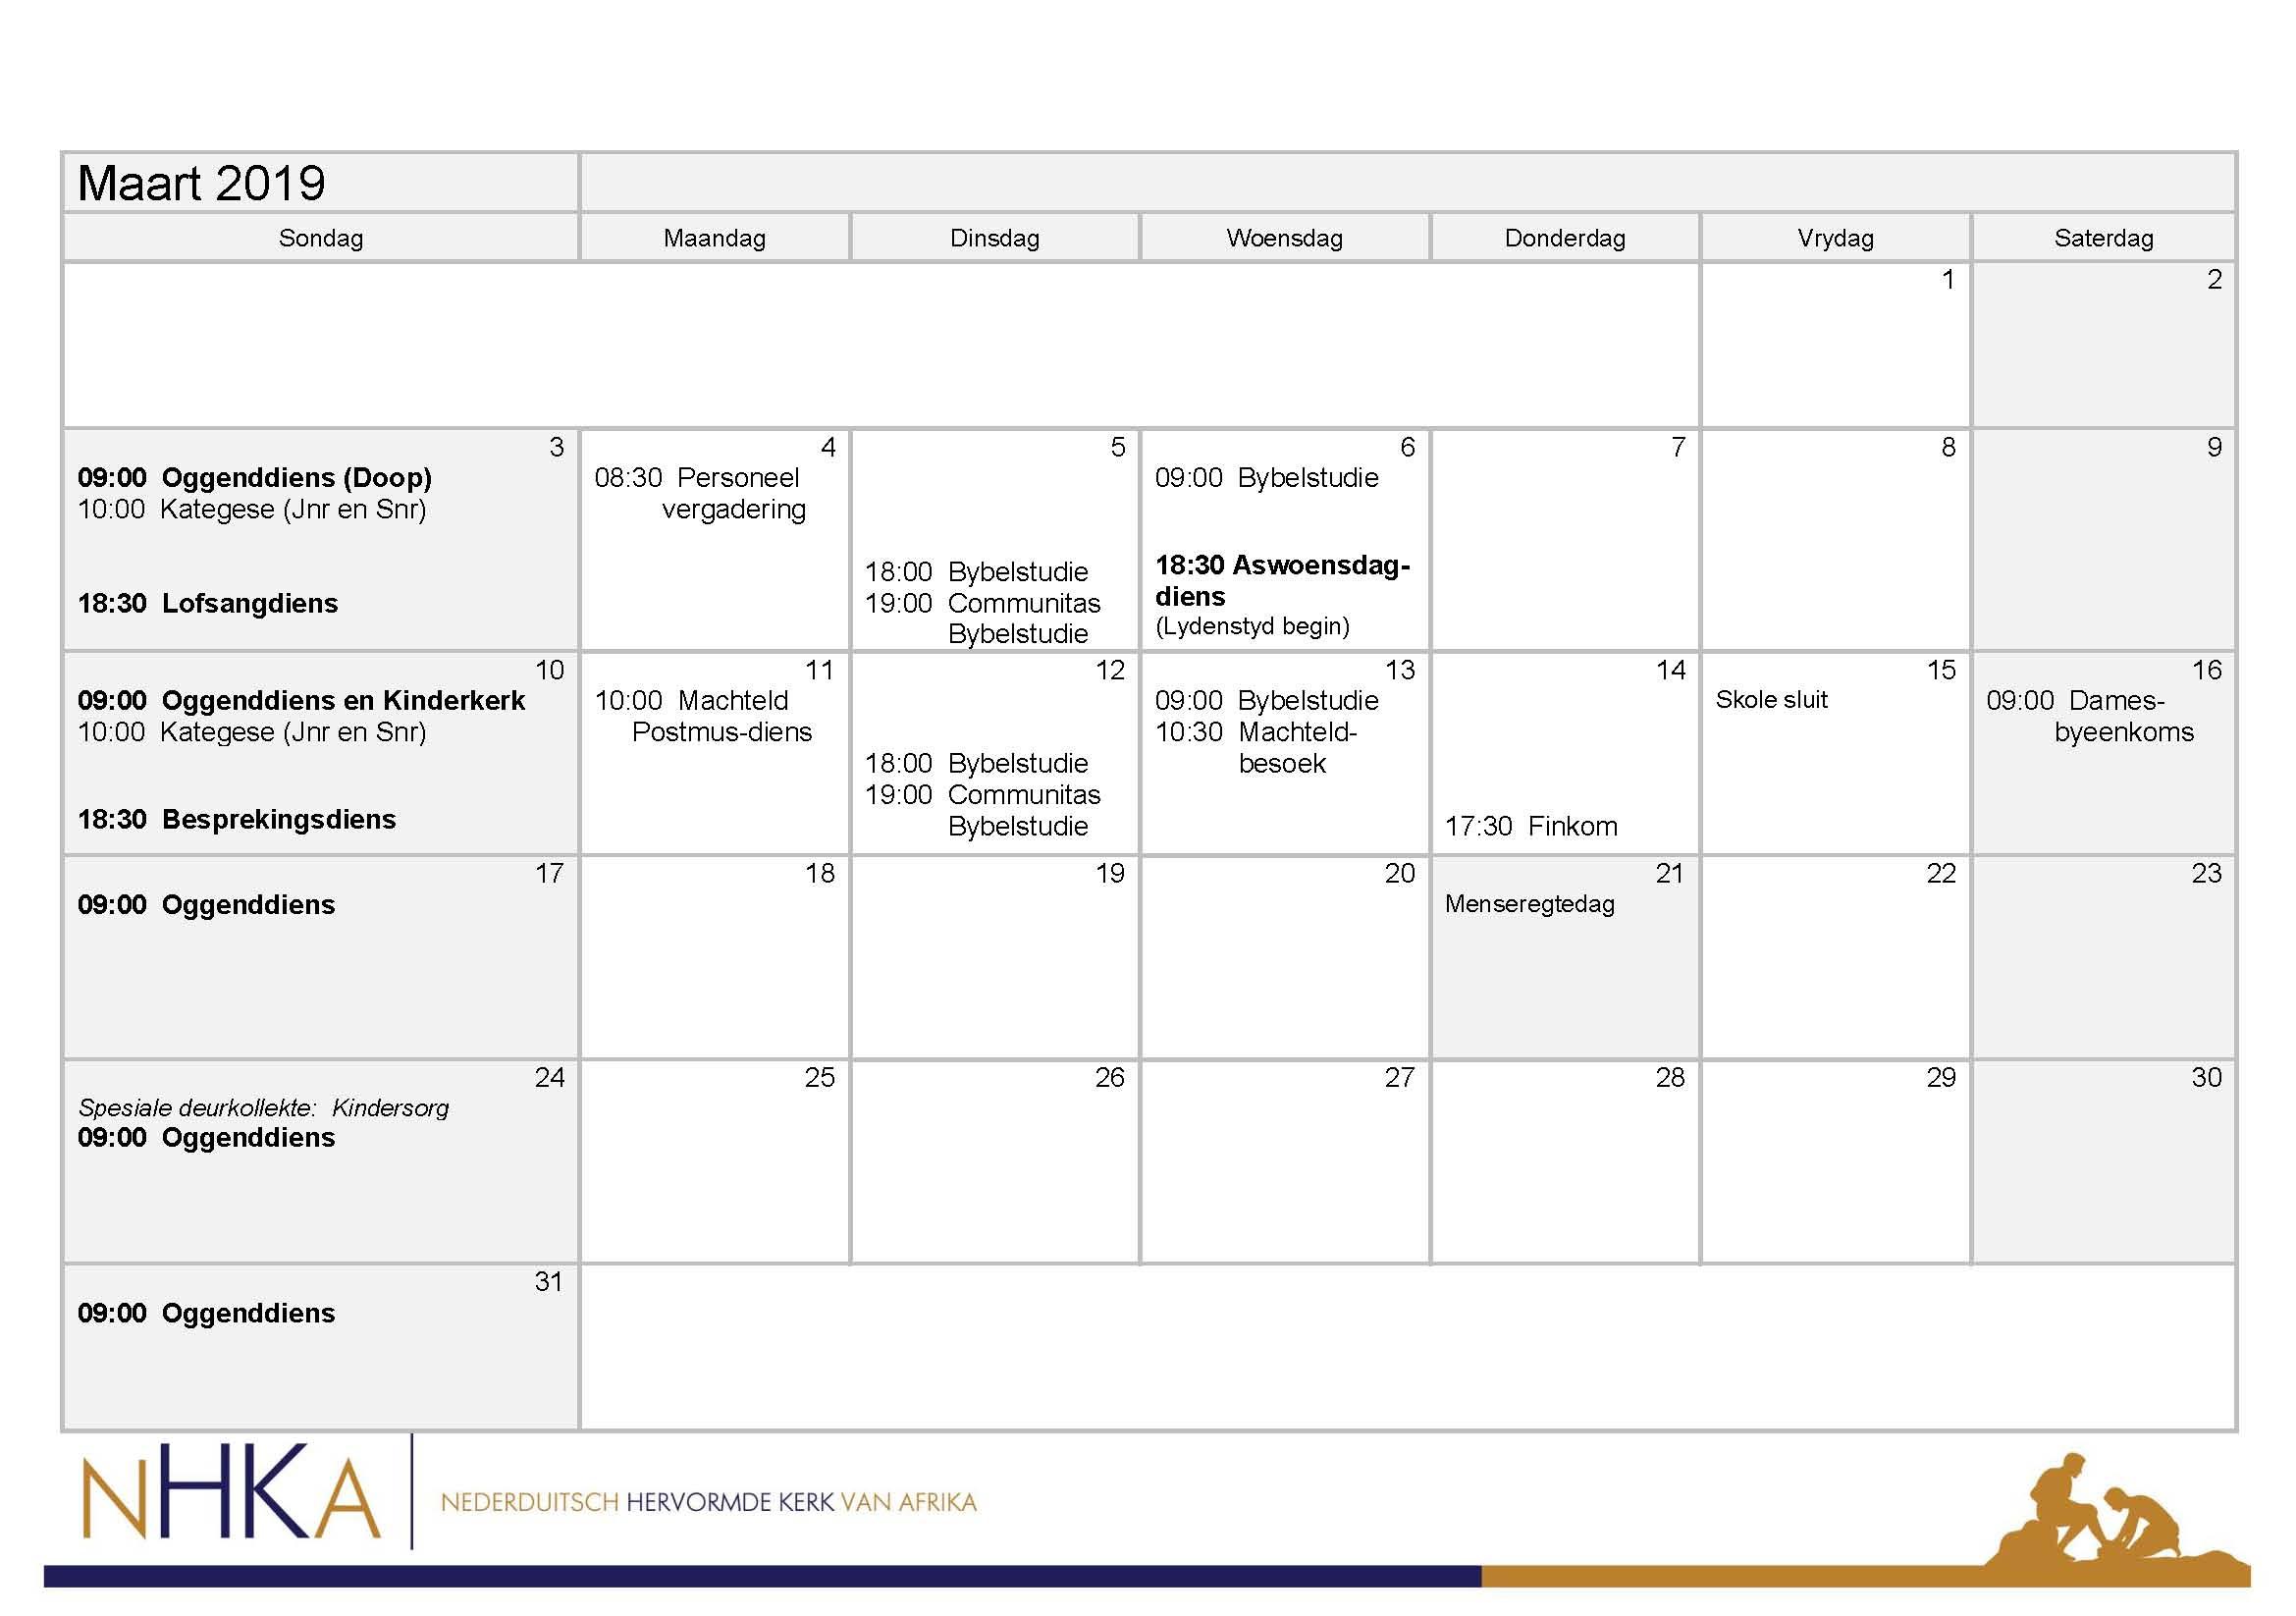 nhka 2019 Pretoria-Oos kalender_Page_03.jpg